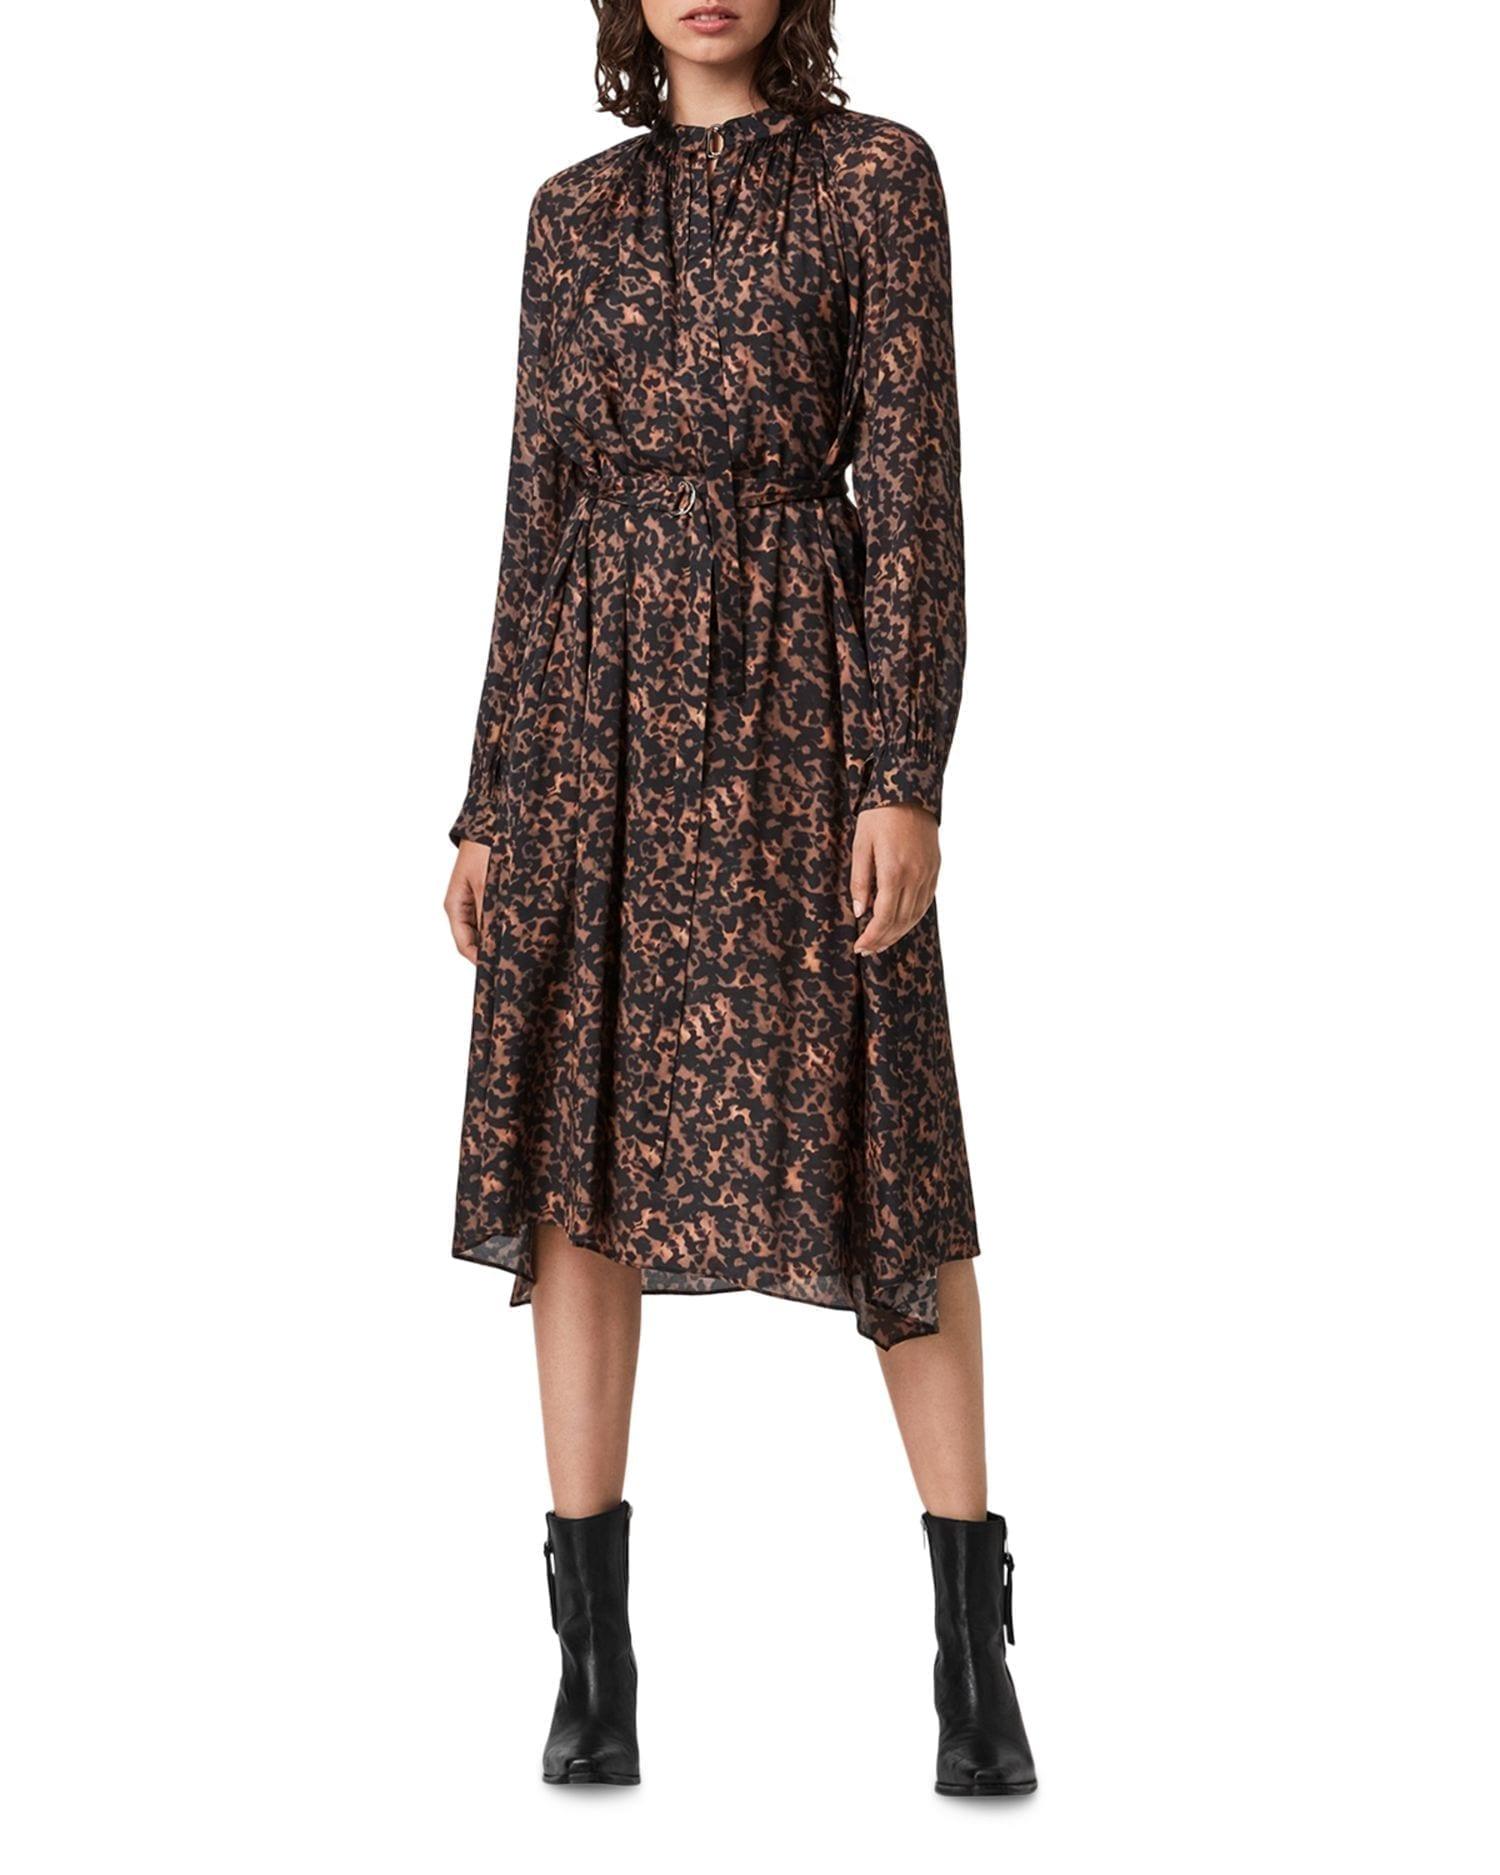 ALLSAINTS Nina Torto Printed Belted Dress